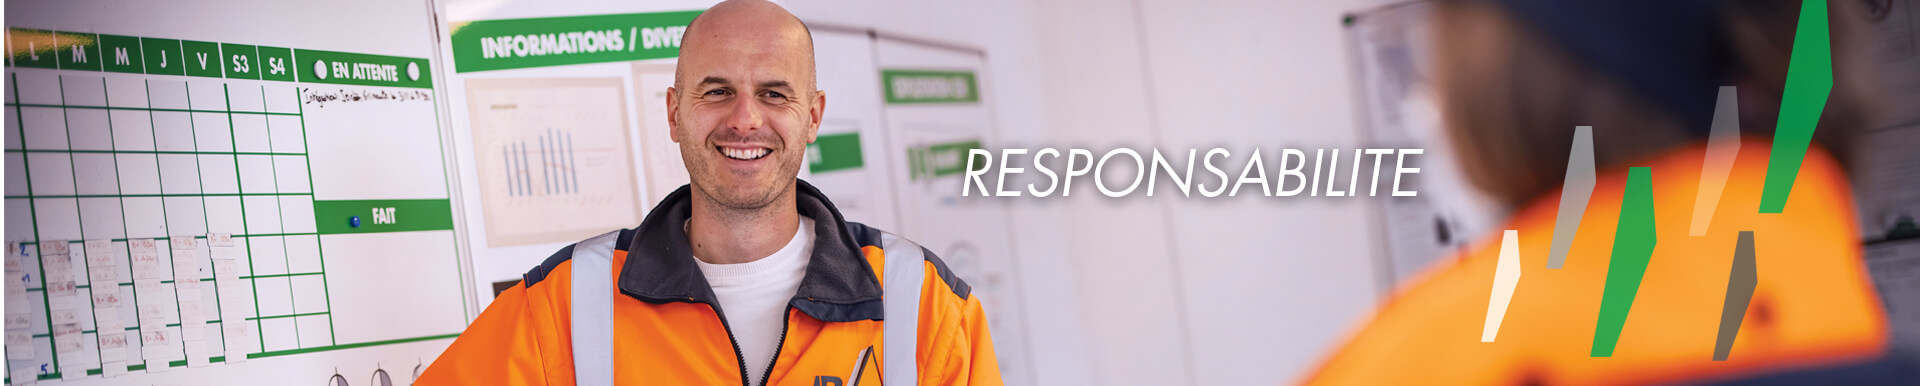 Slider-RESPONSABILITEcampagne-2021